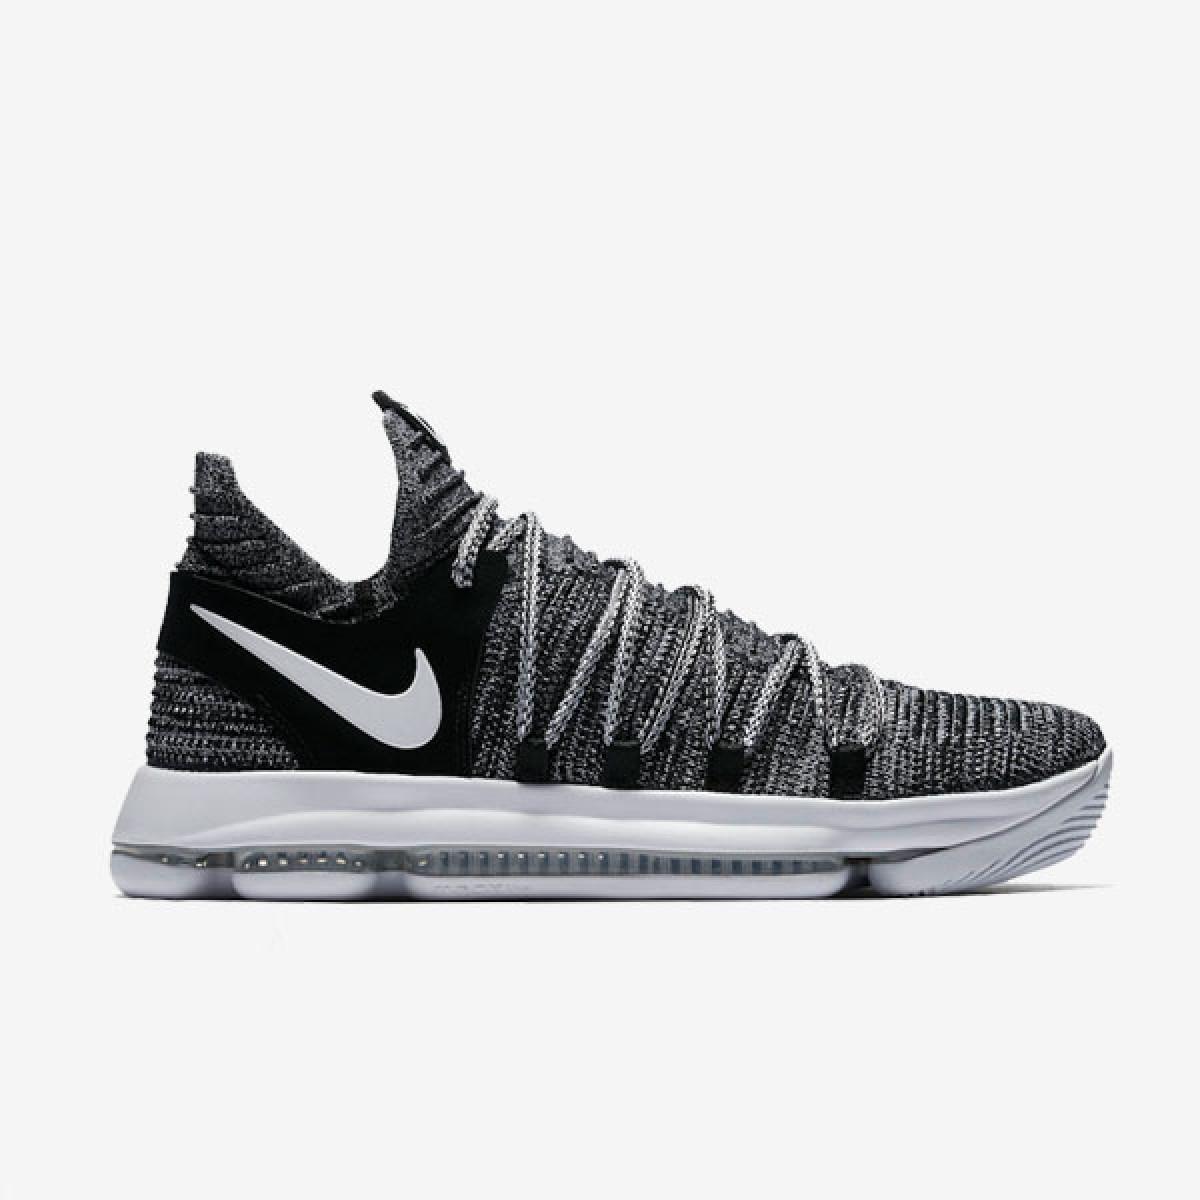 Nike Zoom KD 10 'Oreo'